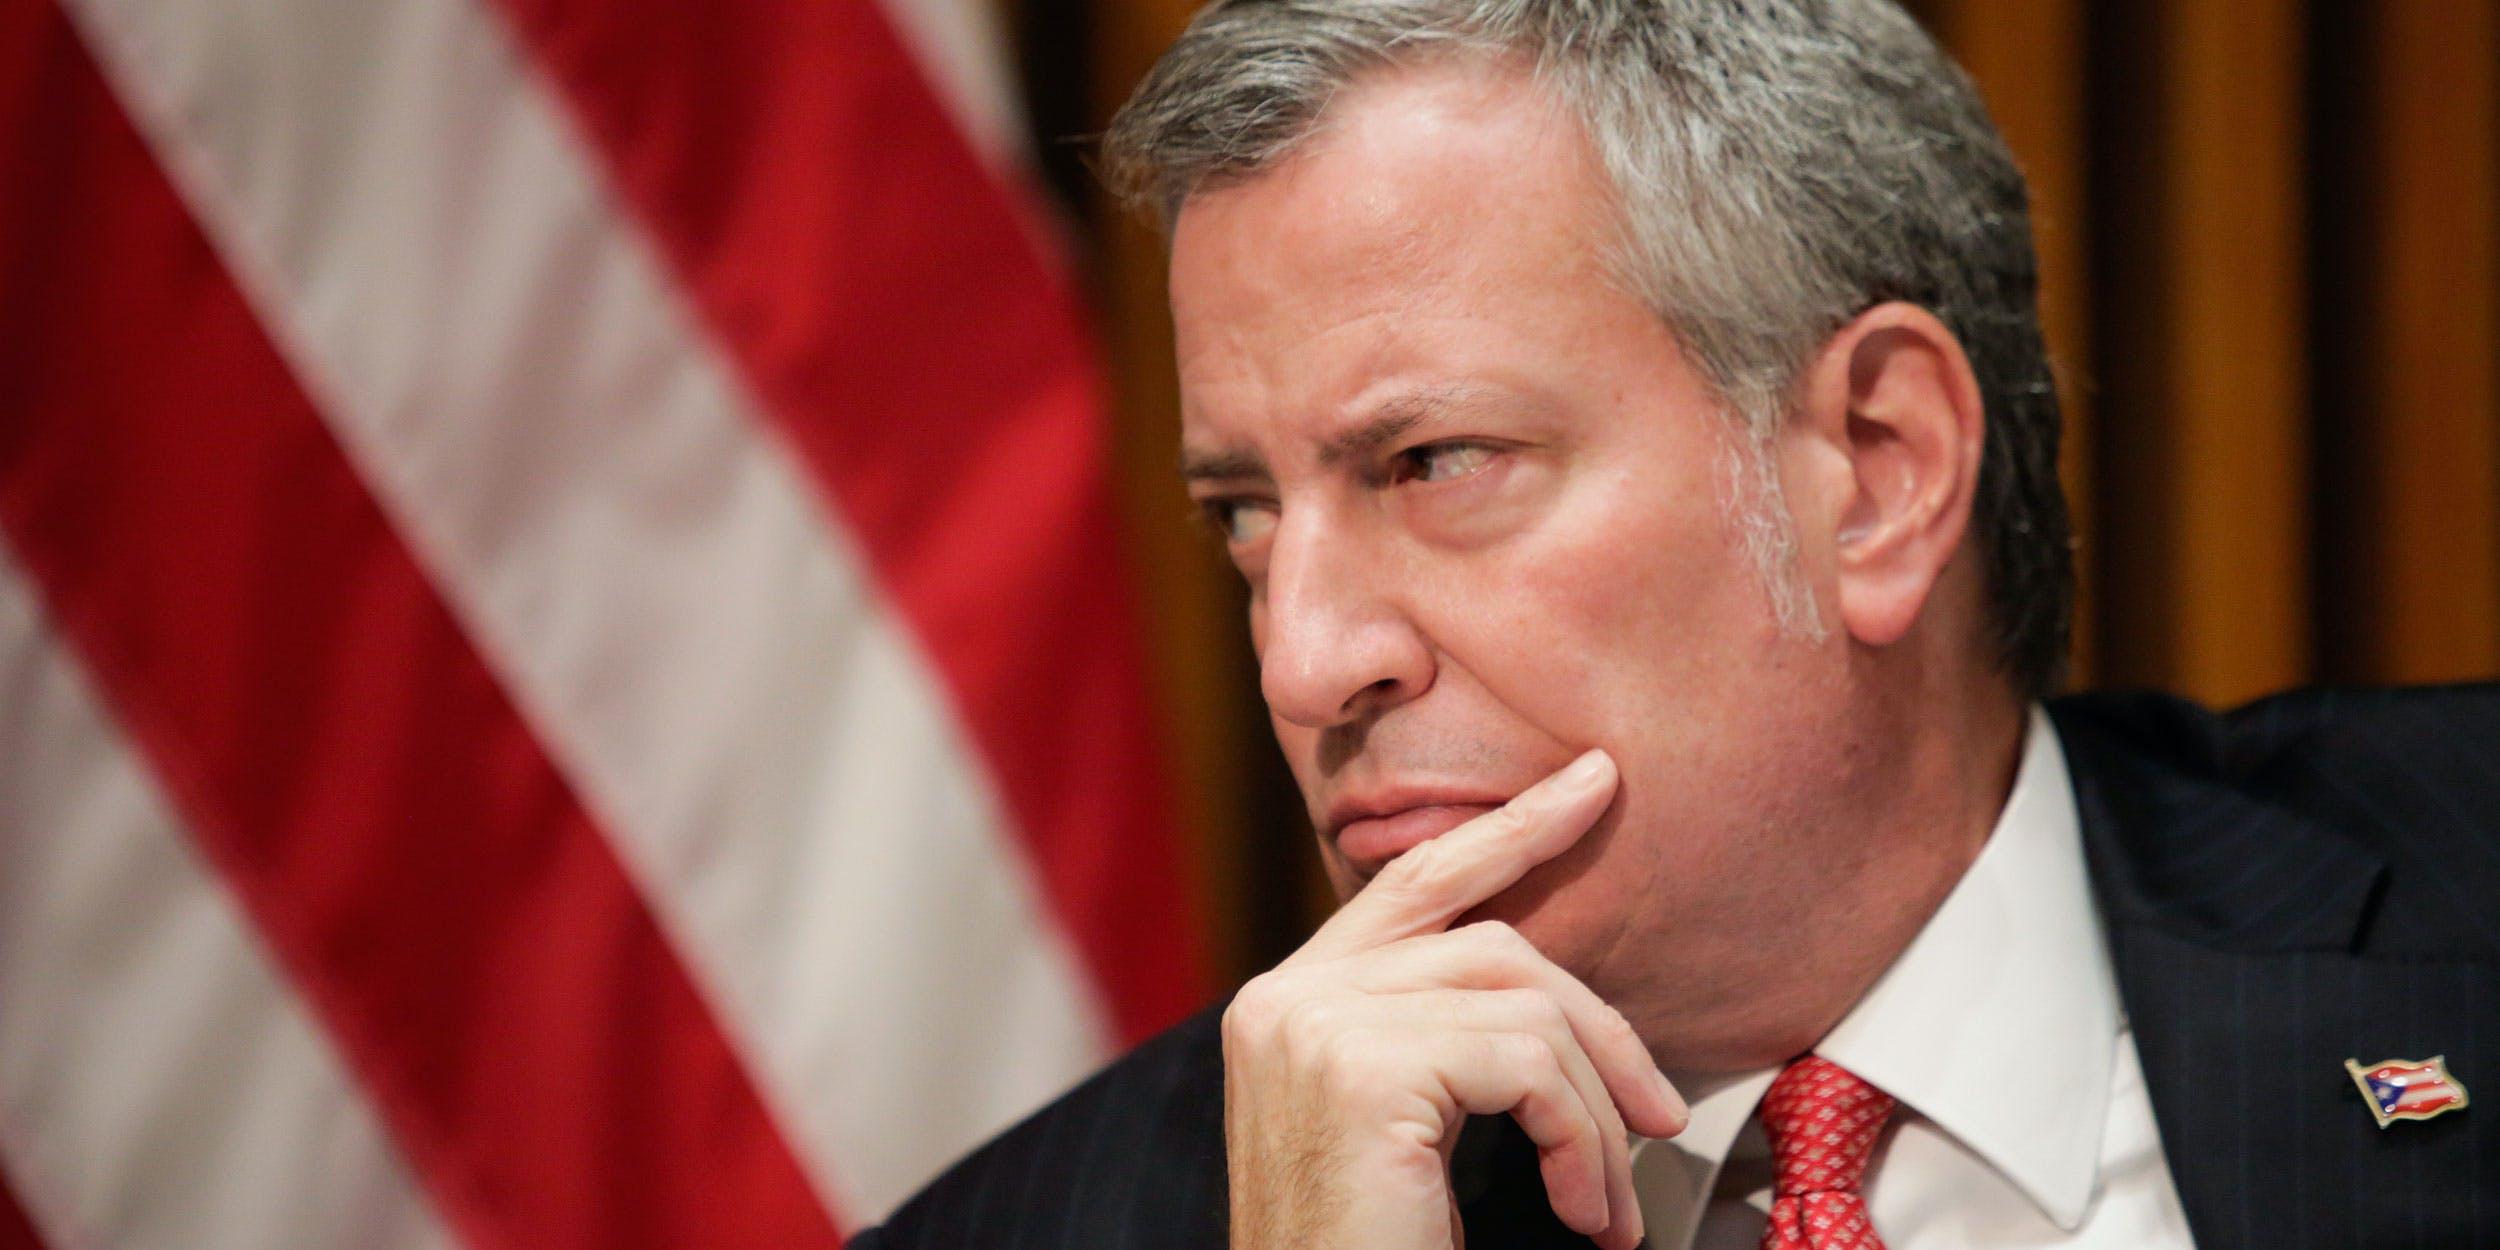 New York City Mayor Bill de Blasio listens to a question